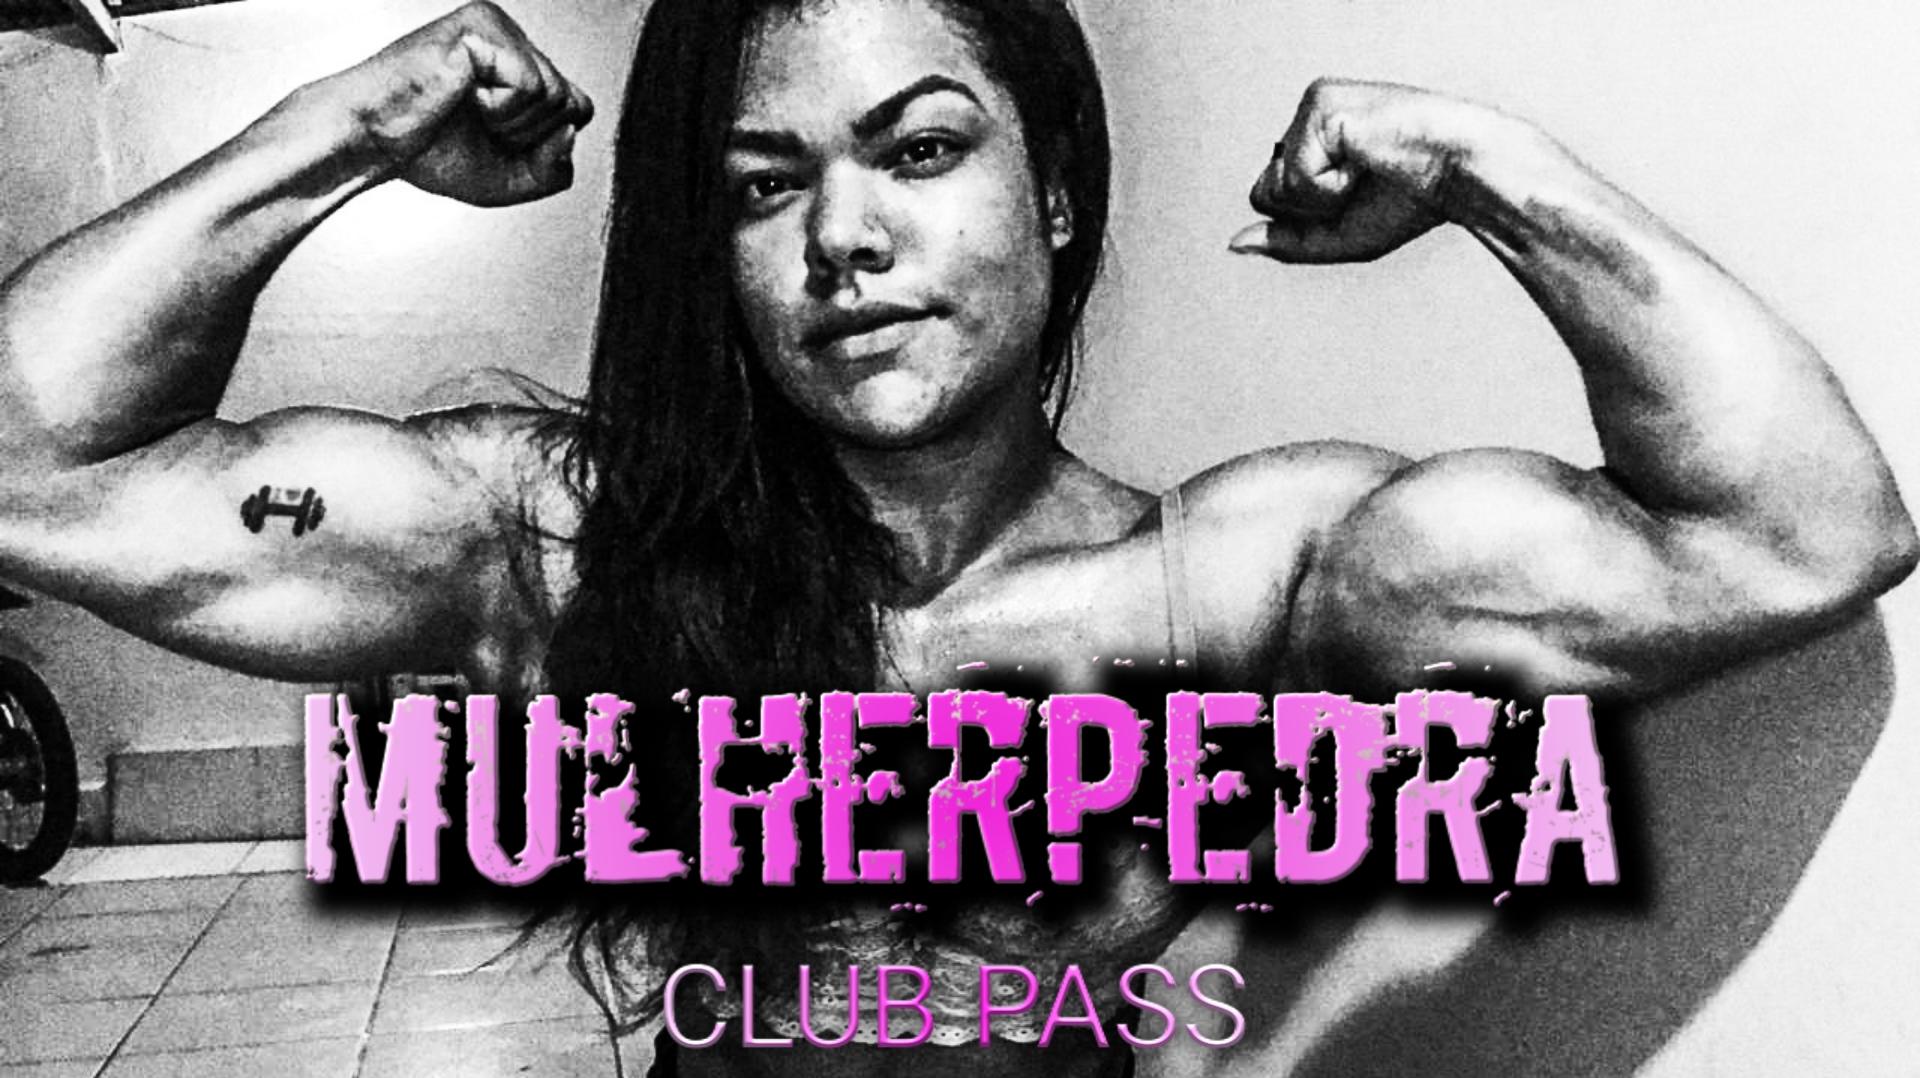 Mulherpedra Club Pass